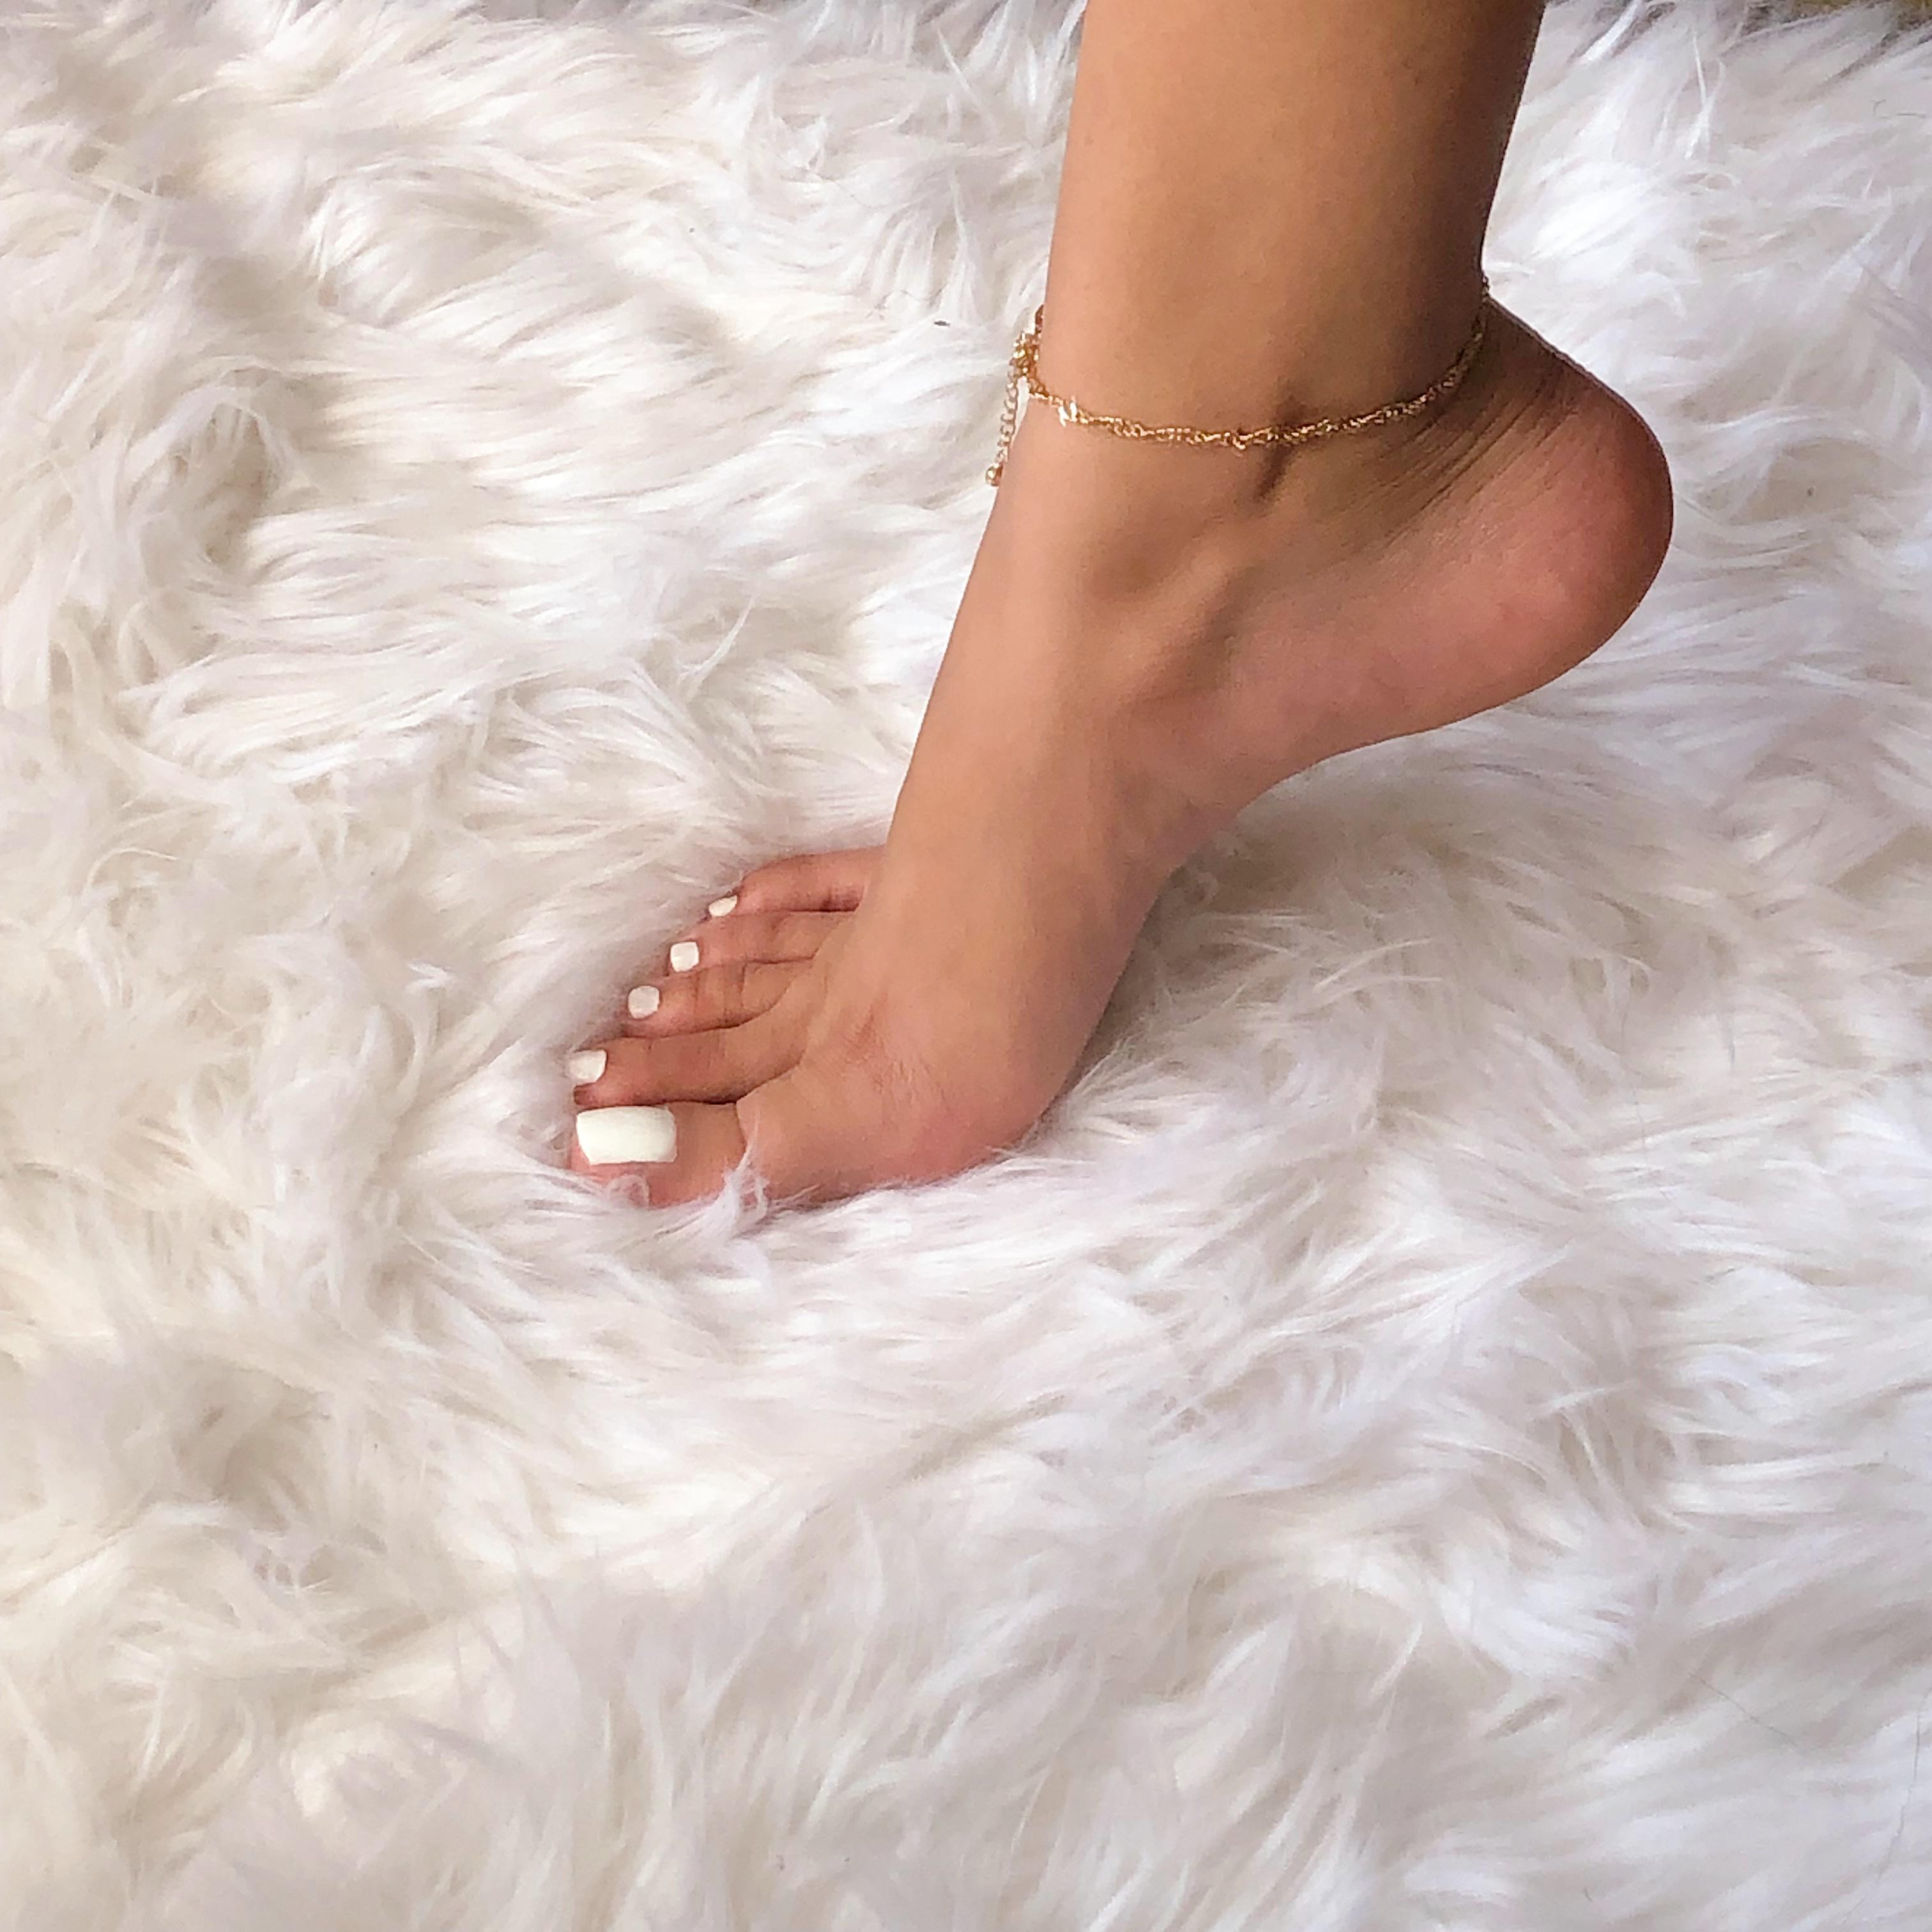 FeetBliss Patreon